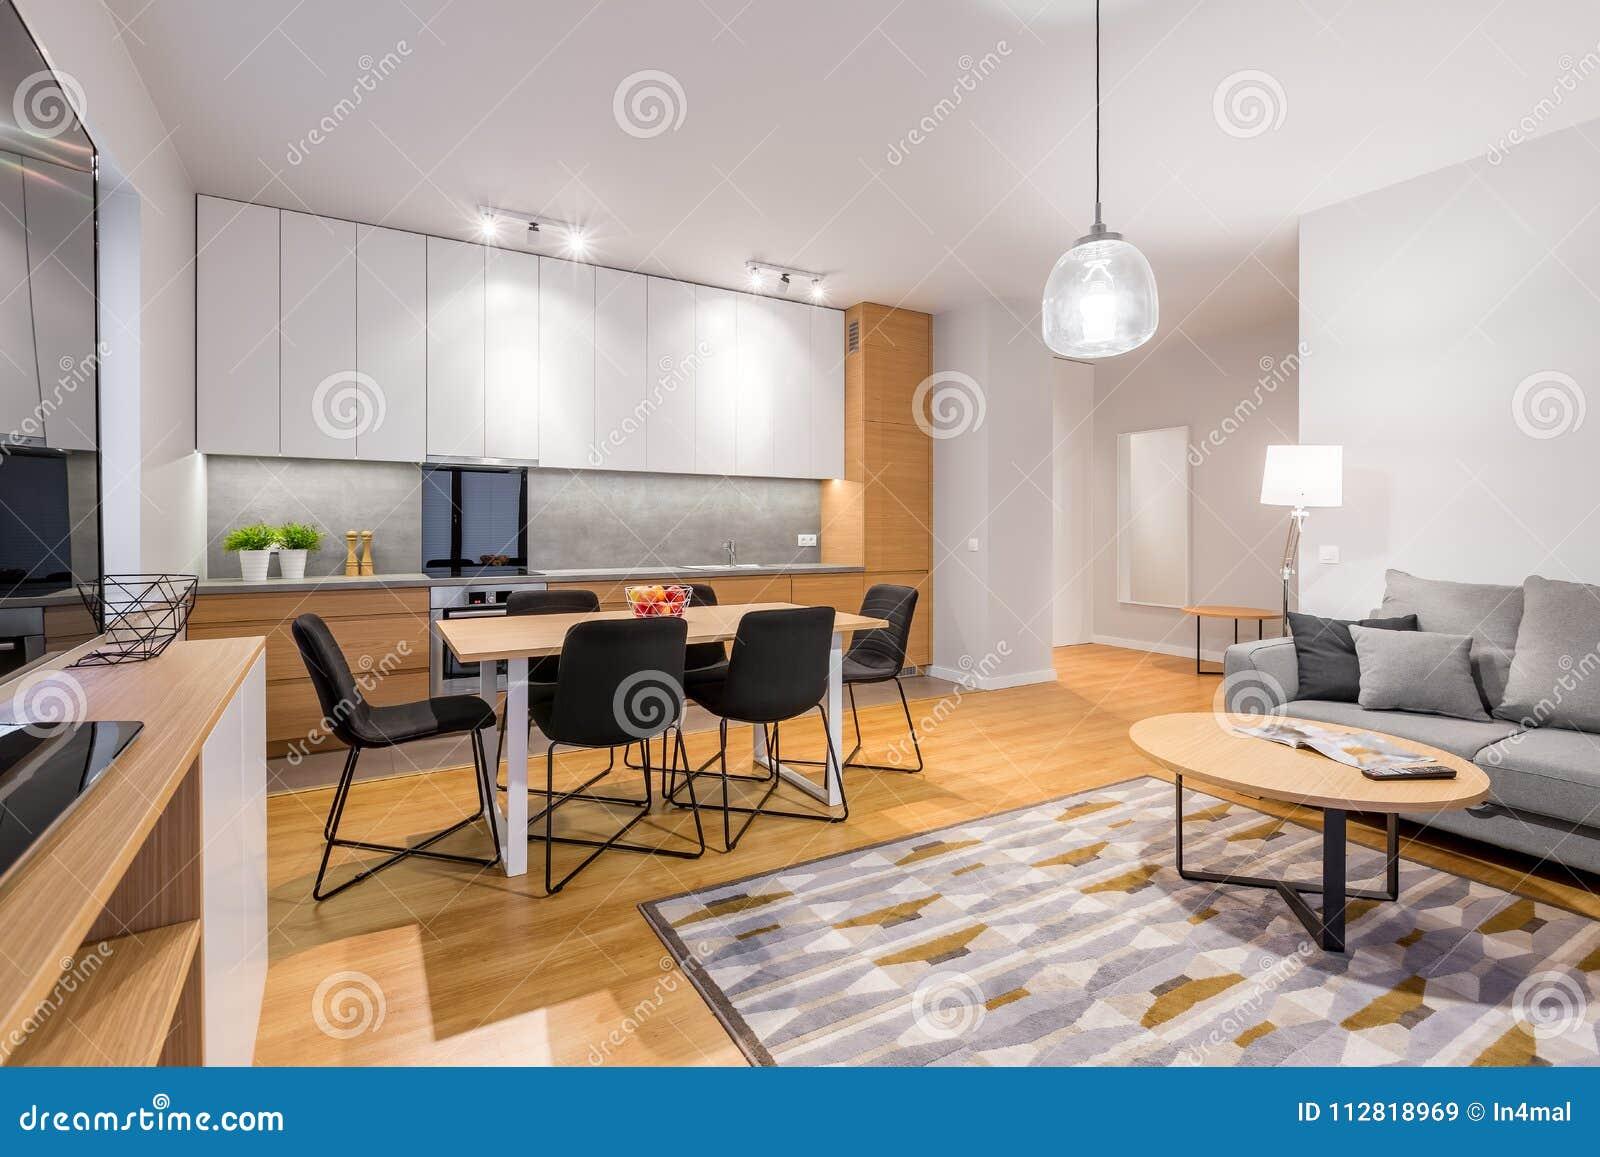 Interior Of Studio Apartment Stock Image - Image of flat ...